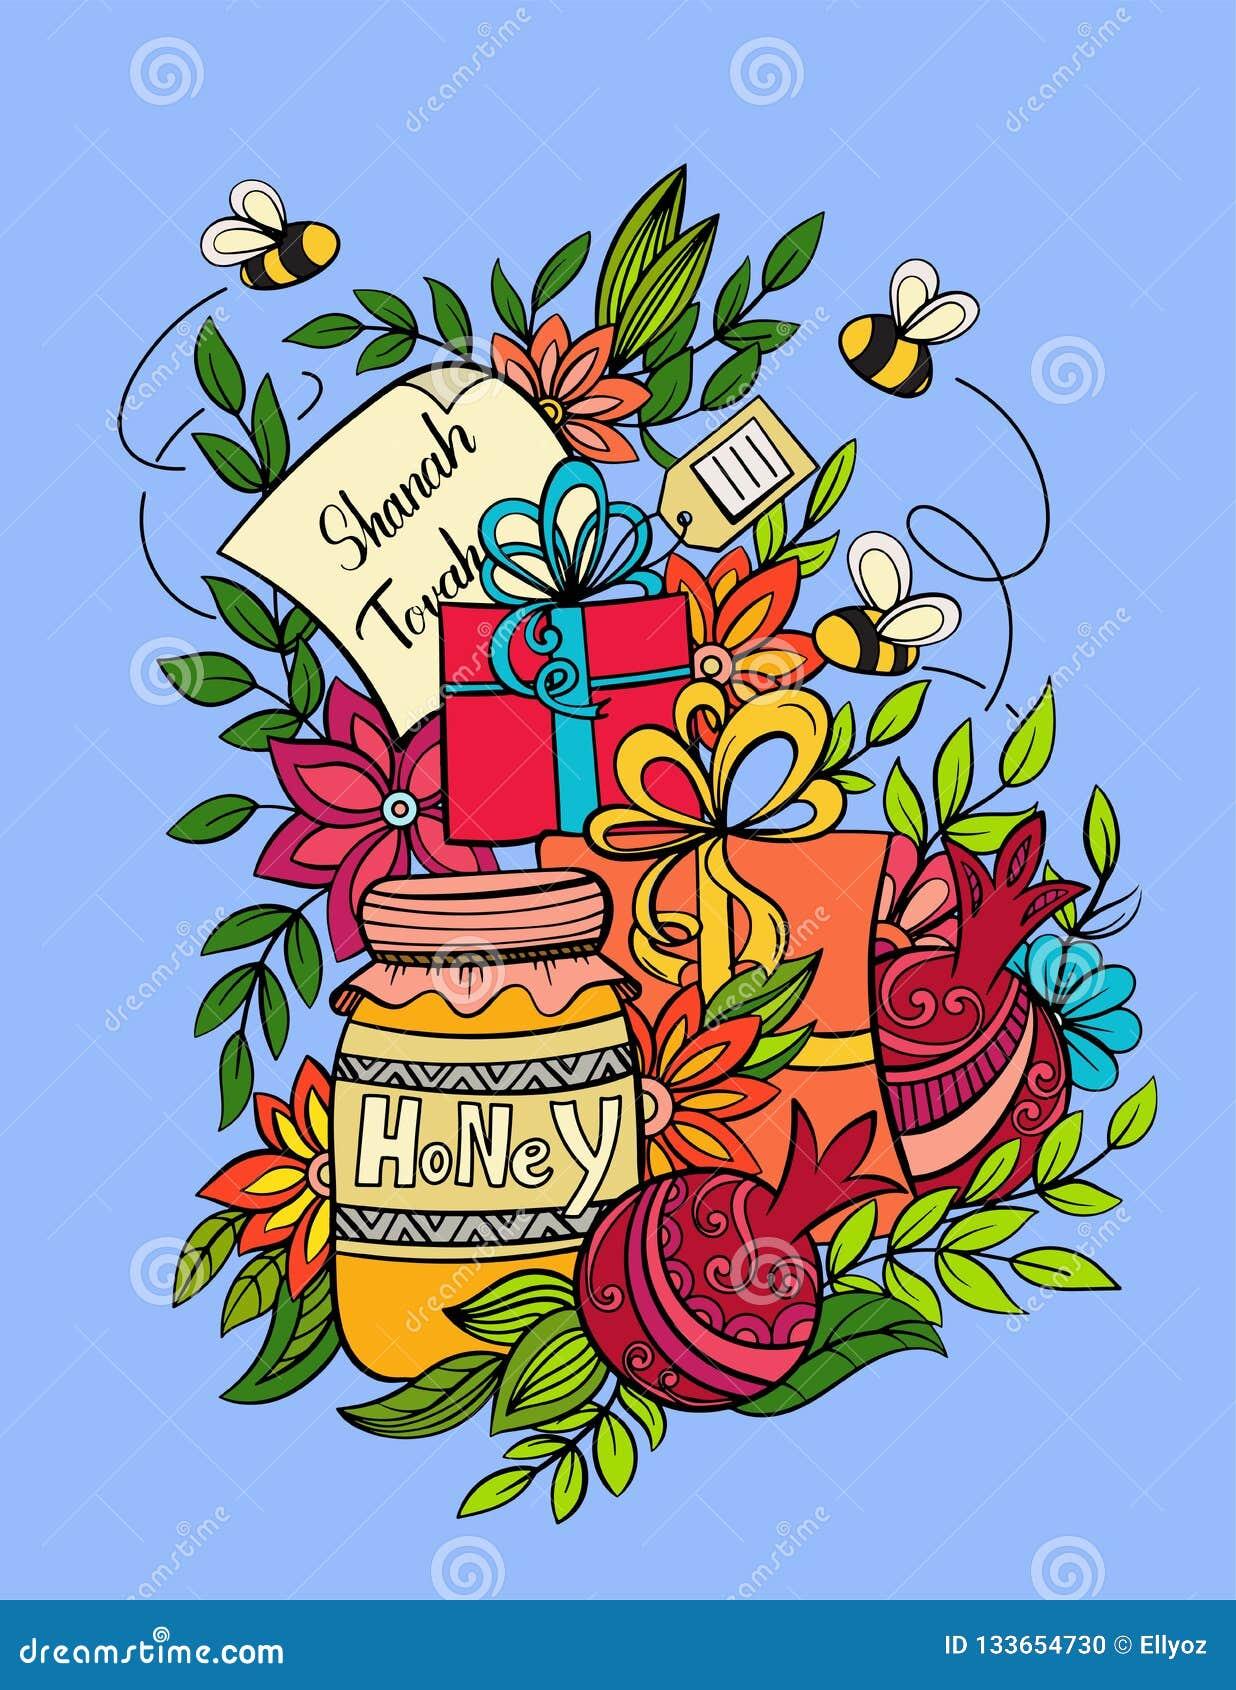 Rosh Hashanah Greeting Card Stock Vector - Illustration of ...